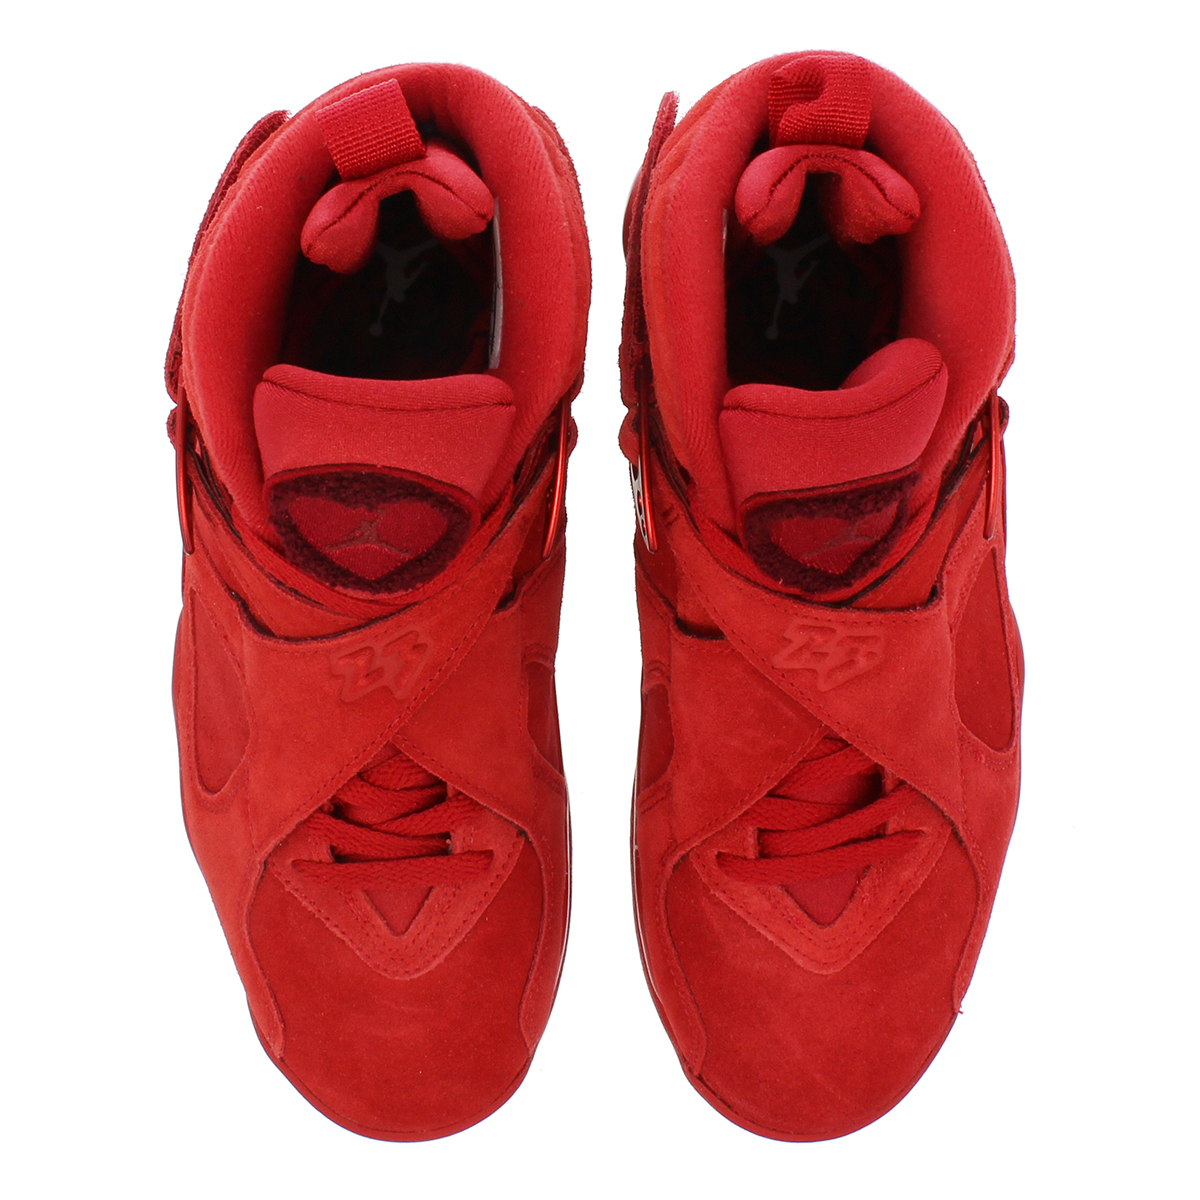 premium selection 1fb62 4406f NIKE WMNS AIR JORDAN 8 RETRO VDAY Nike women Air Jordan 8 nostalgic GYM  RED/EMBER GLOW/TEAM RED aq2449-614